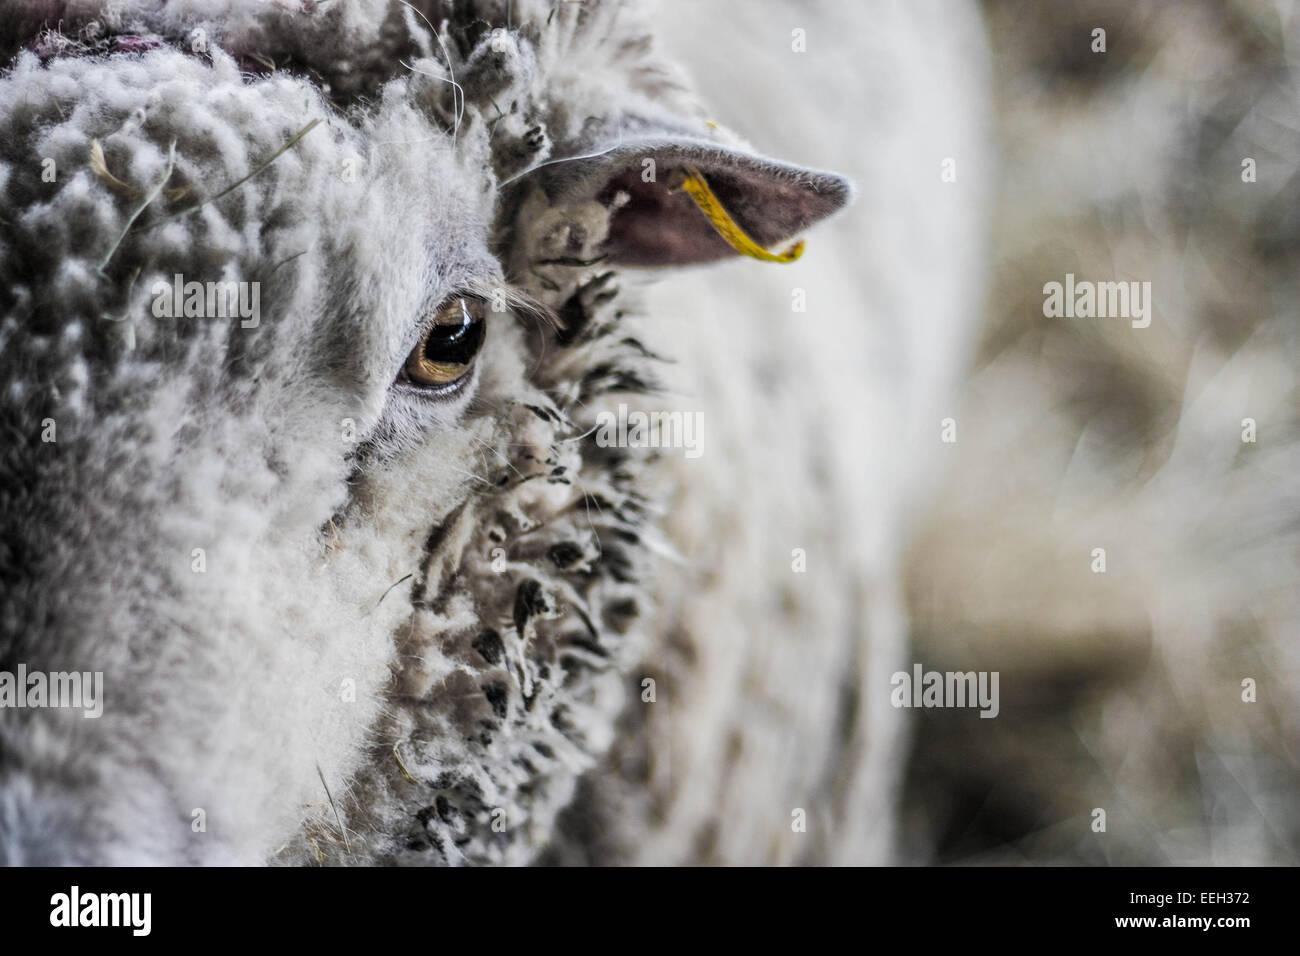 Ram portrait - Stock Image